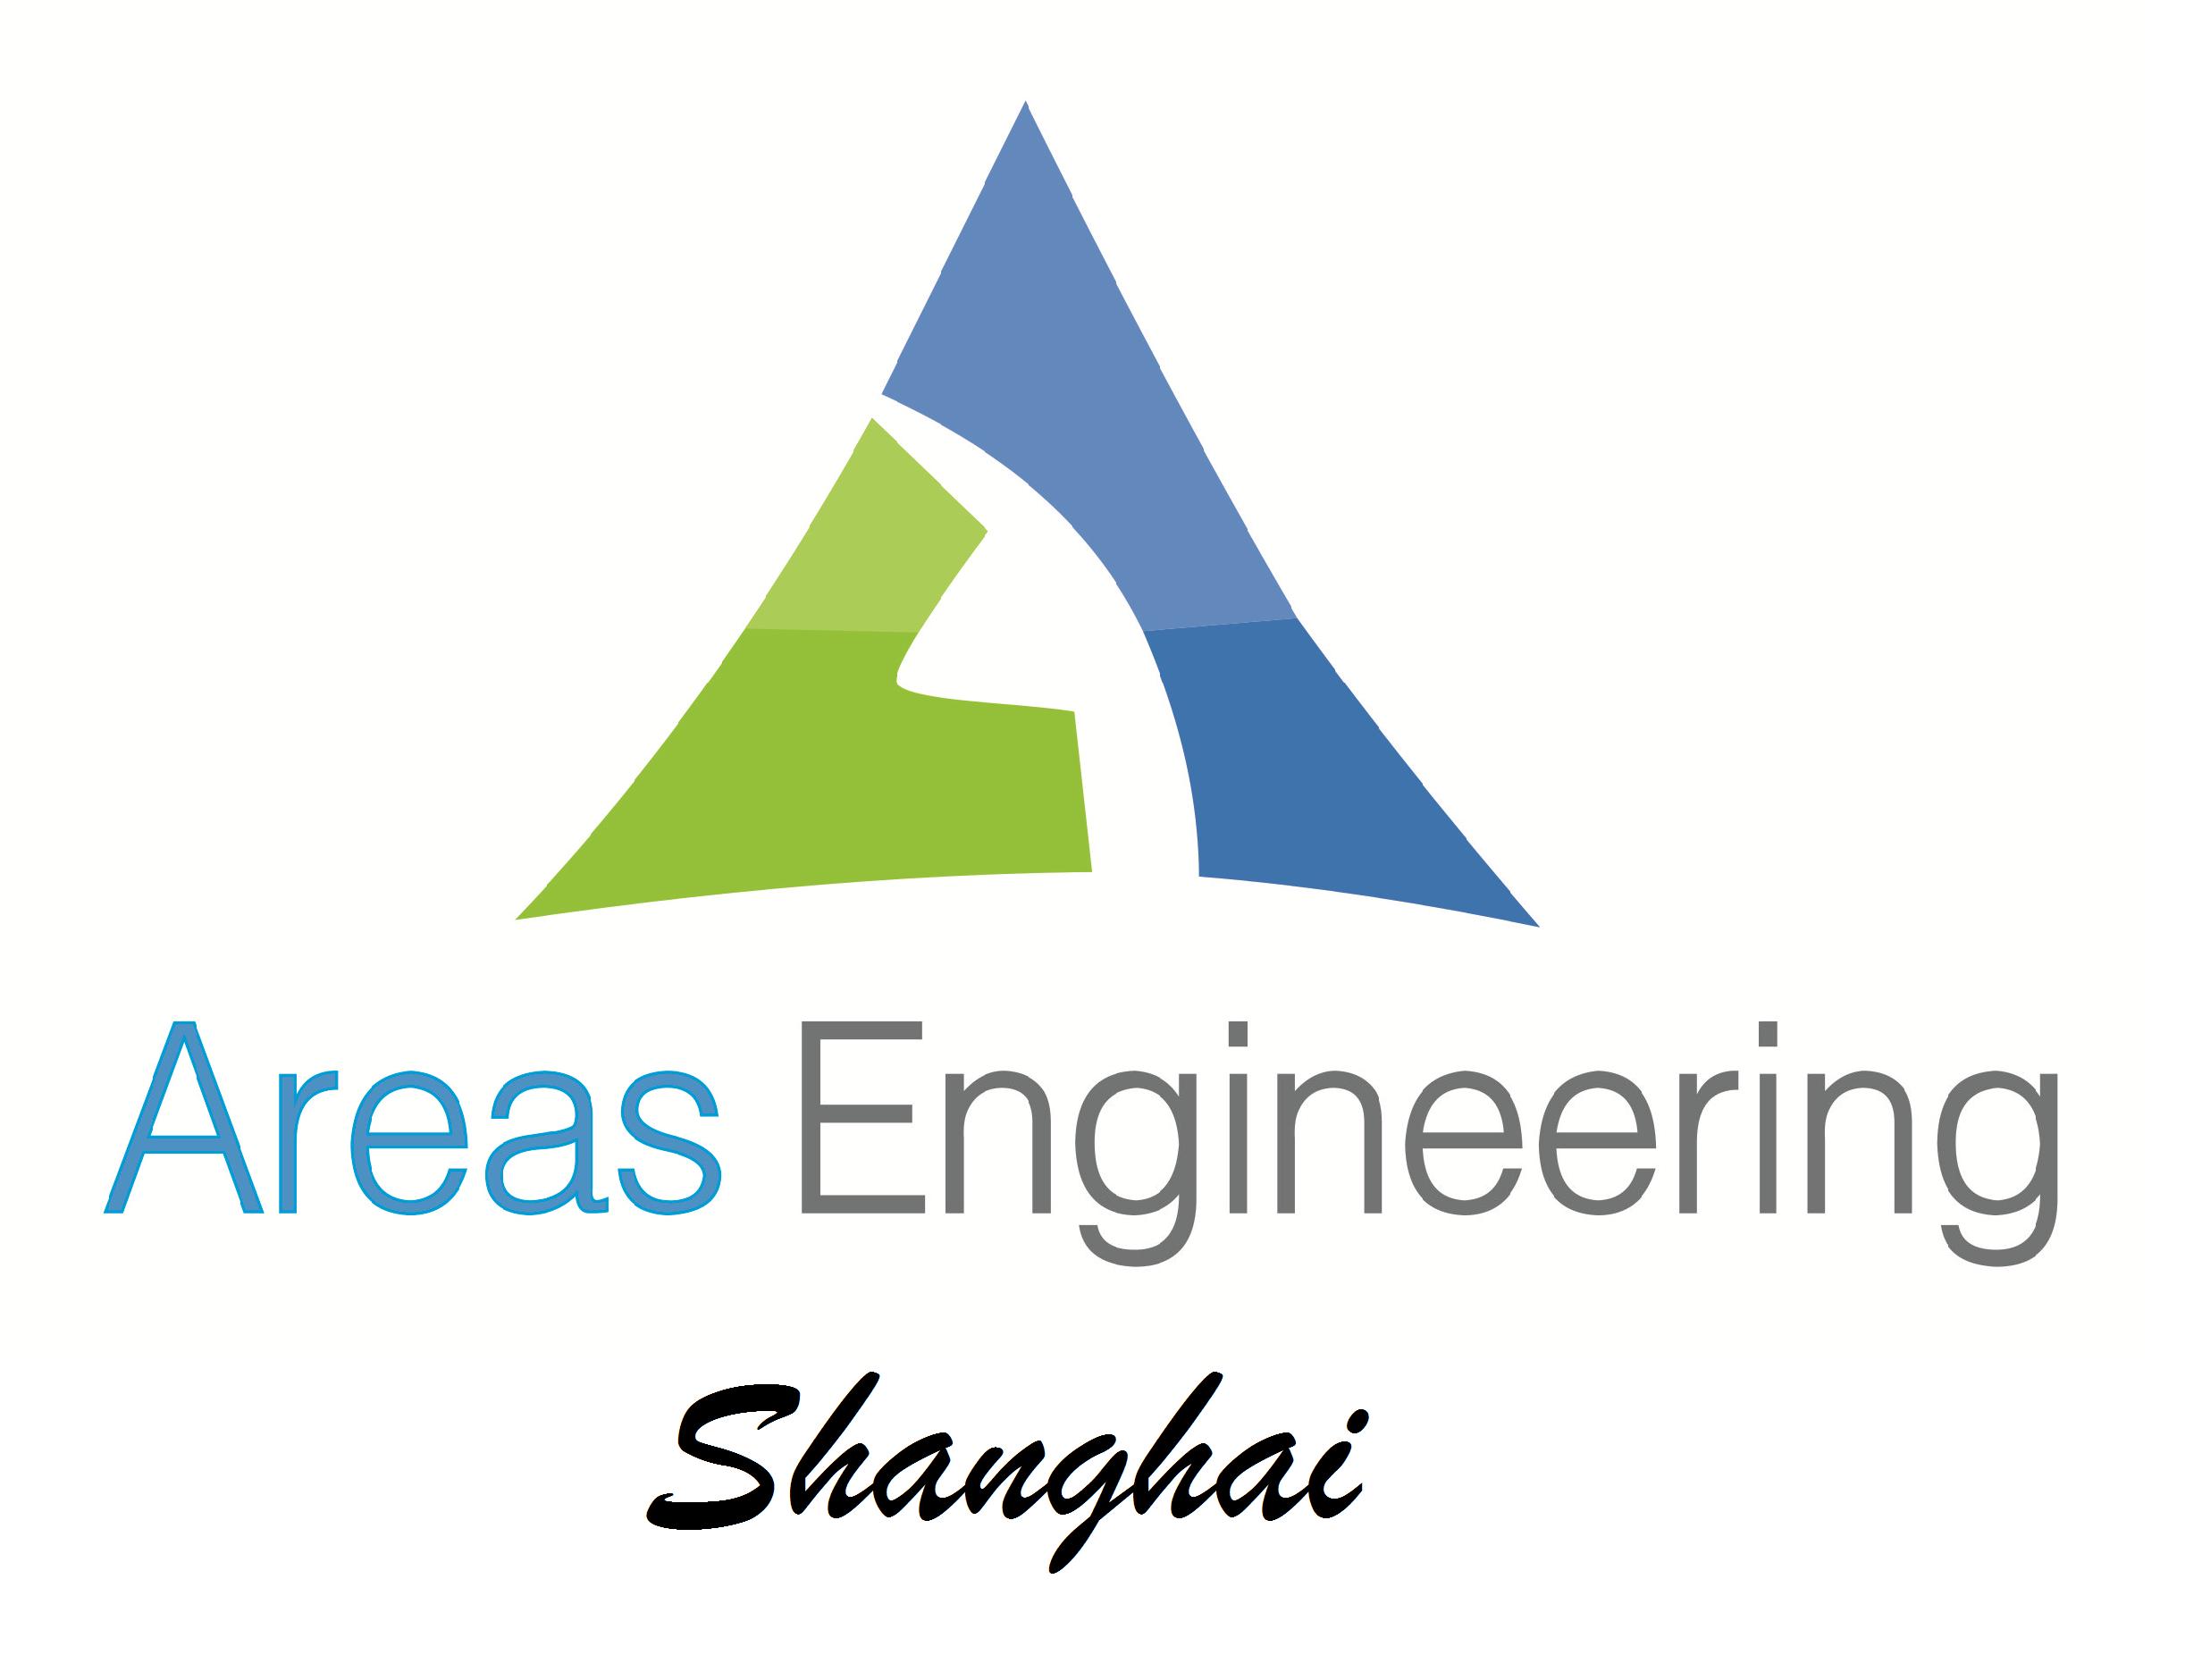 Areas-Engineering